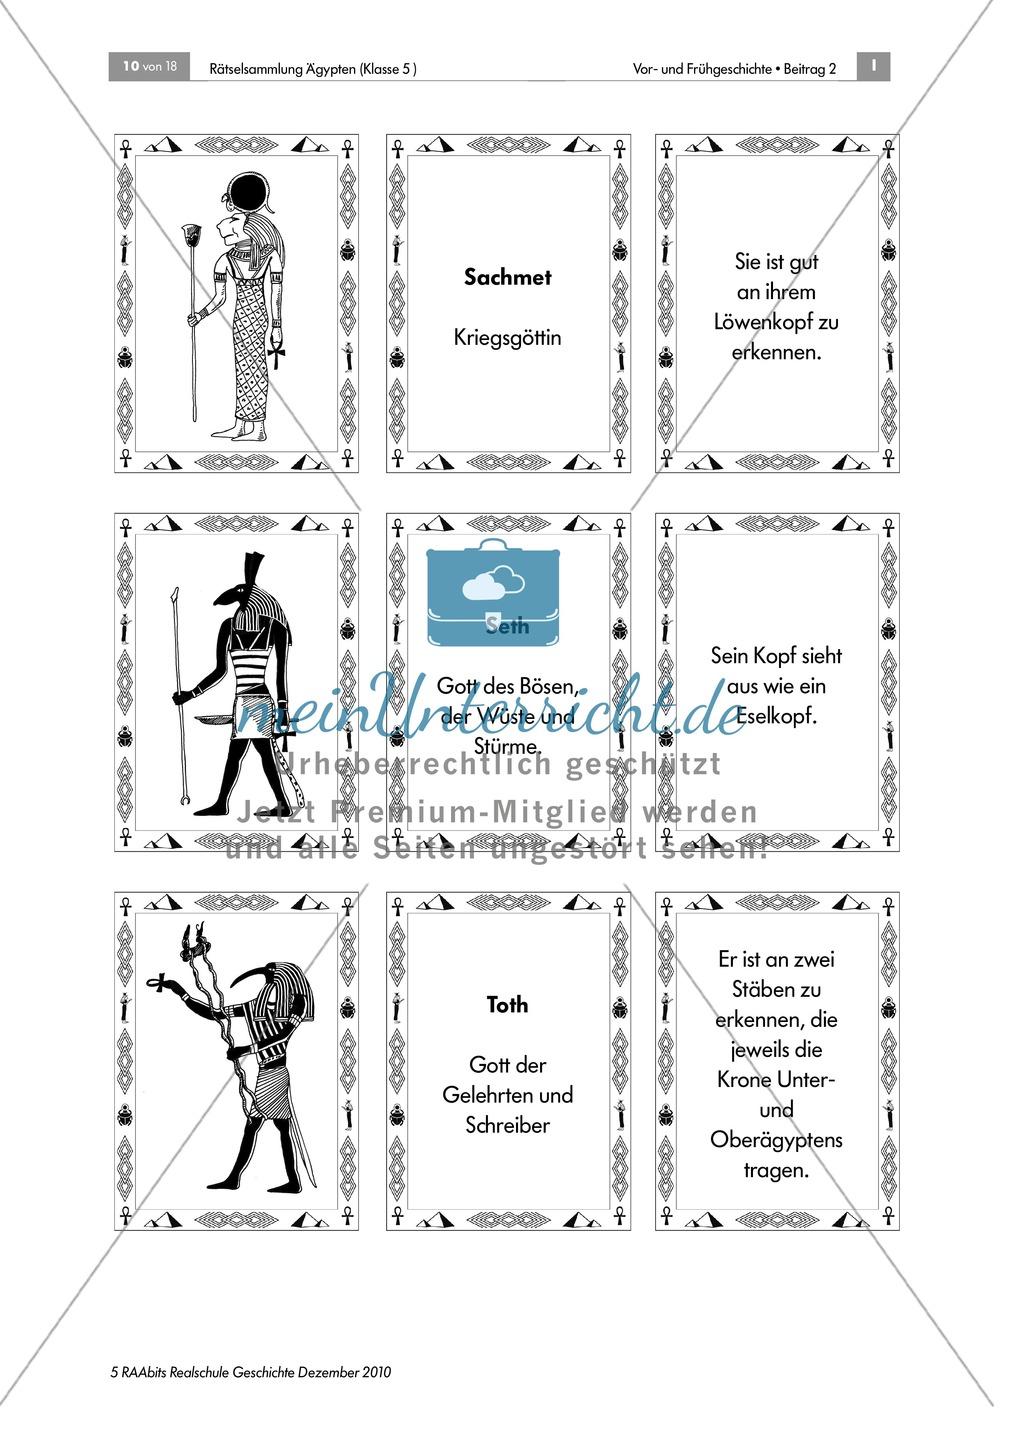 Rätselsammlung Ägypten: Im Götter-Tritett Namen, Attribute und Funktion der ägypt. Götter benennen Preview 3